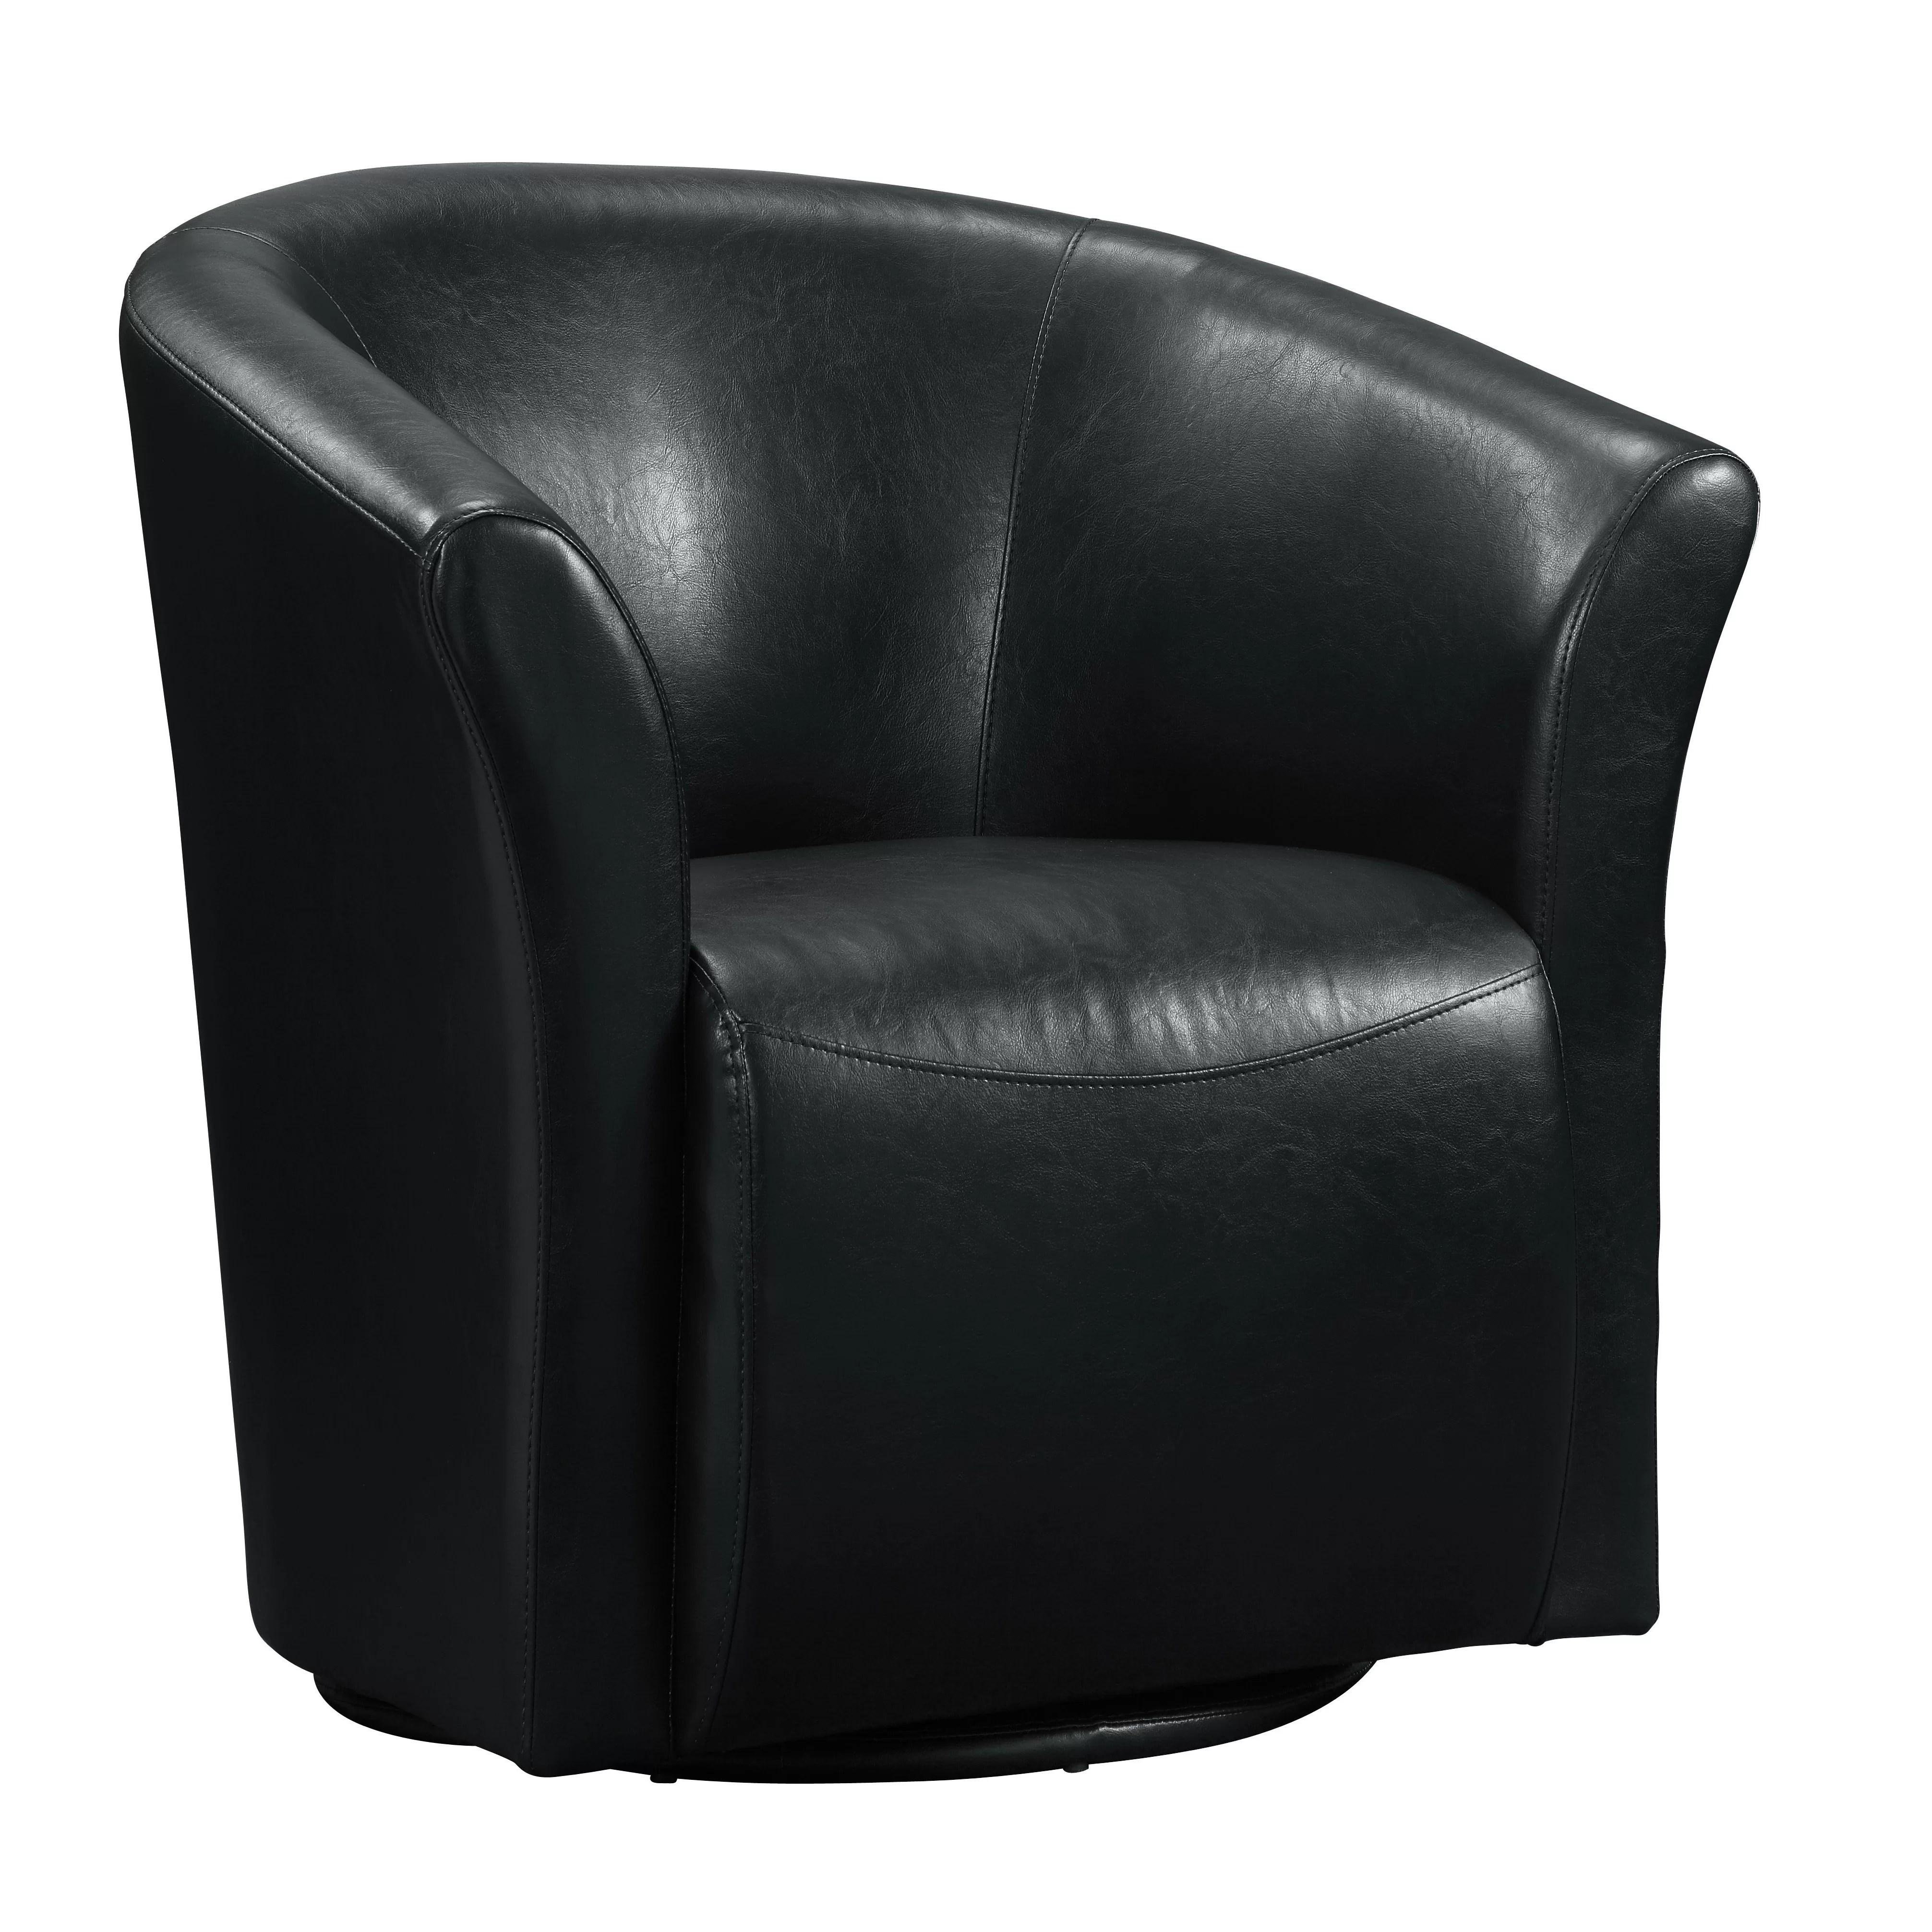 swivel arm chairs black spandex chair covers for sale elisha wayfair